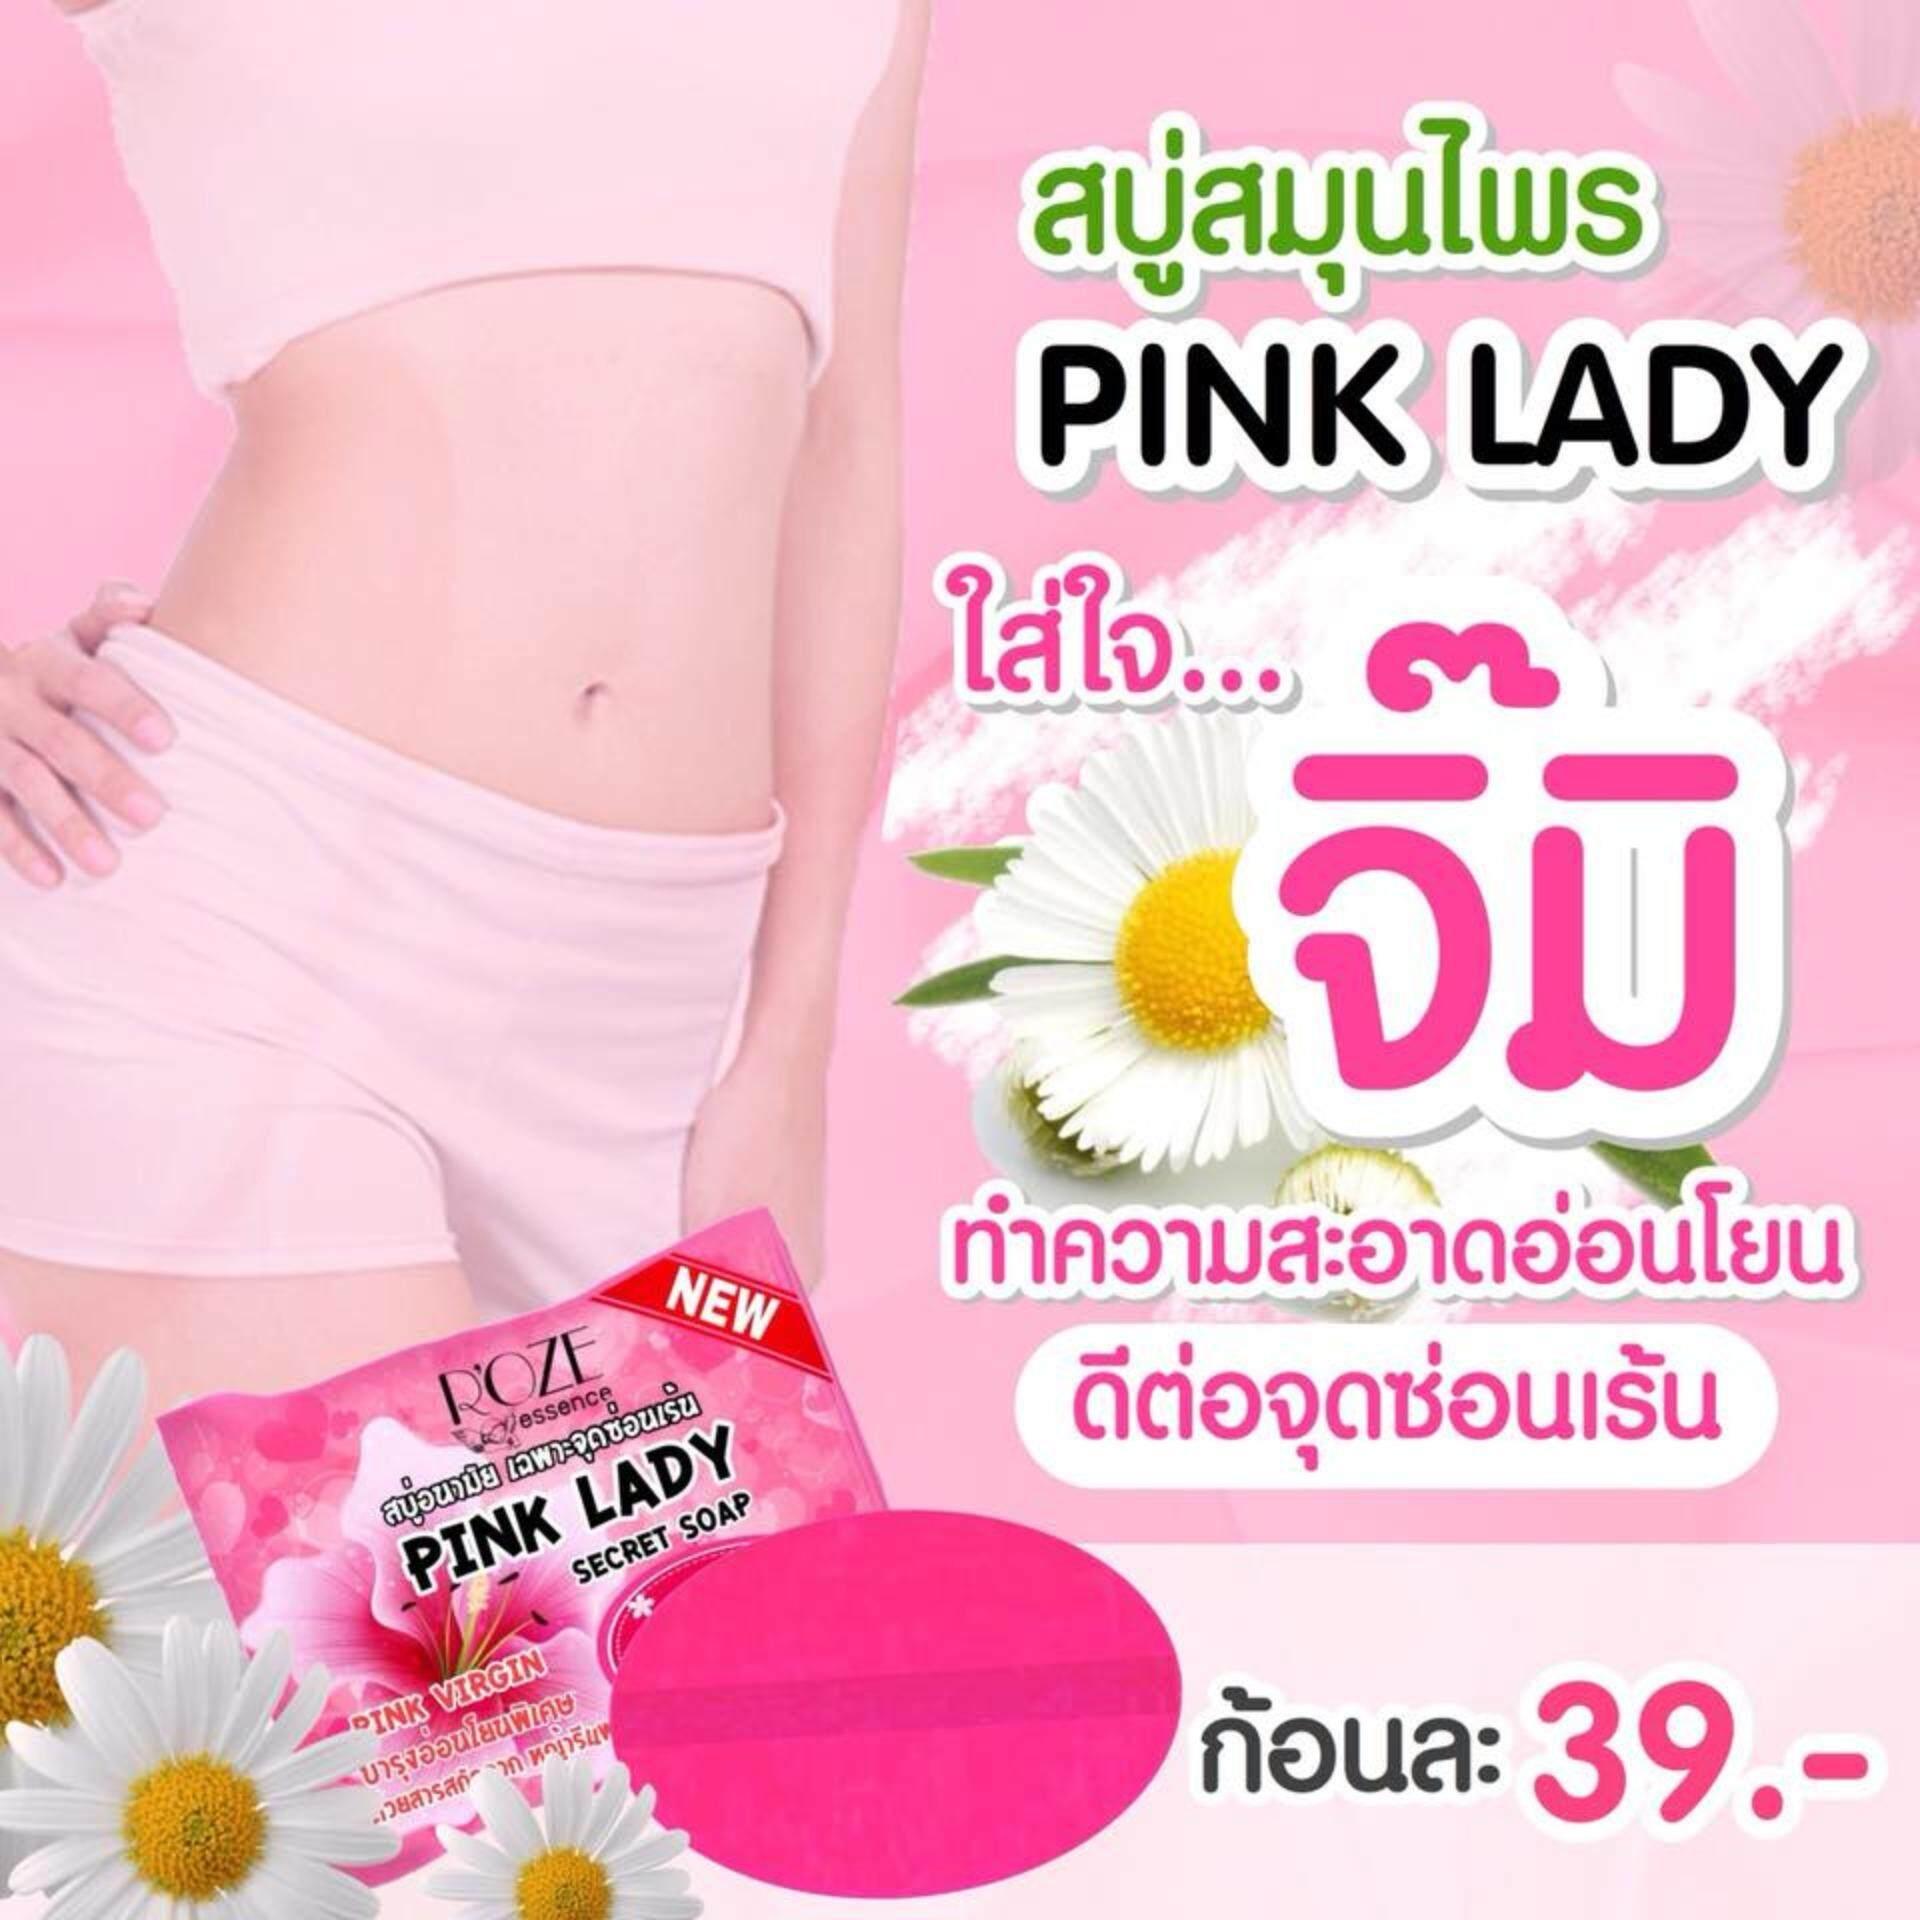 Pink Lady Secret Soap สบู่พิ้งค์เลดี้ สบู่อนามัย สบู่ล้างจุดซ่อนเร้น สบู่หอยหอม สบู่ฟอกจิ๊มิ ก้อนละ 30 กรัม By 168 Thai Shop.